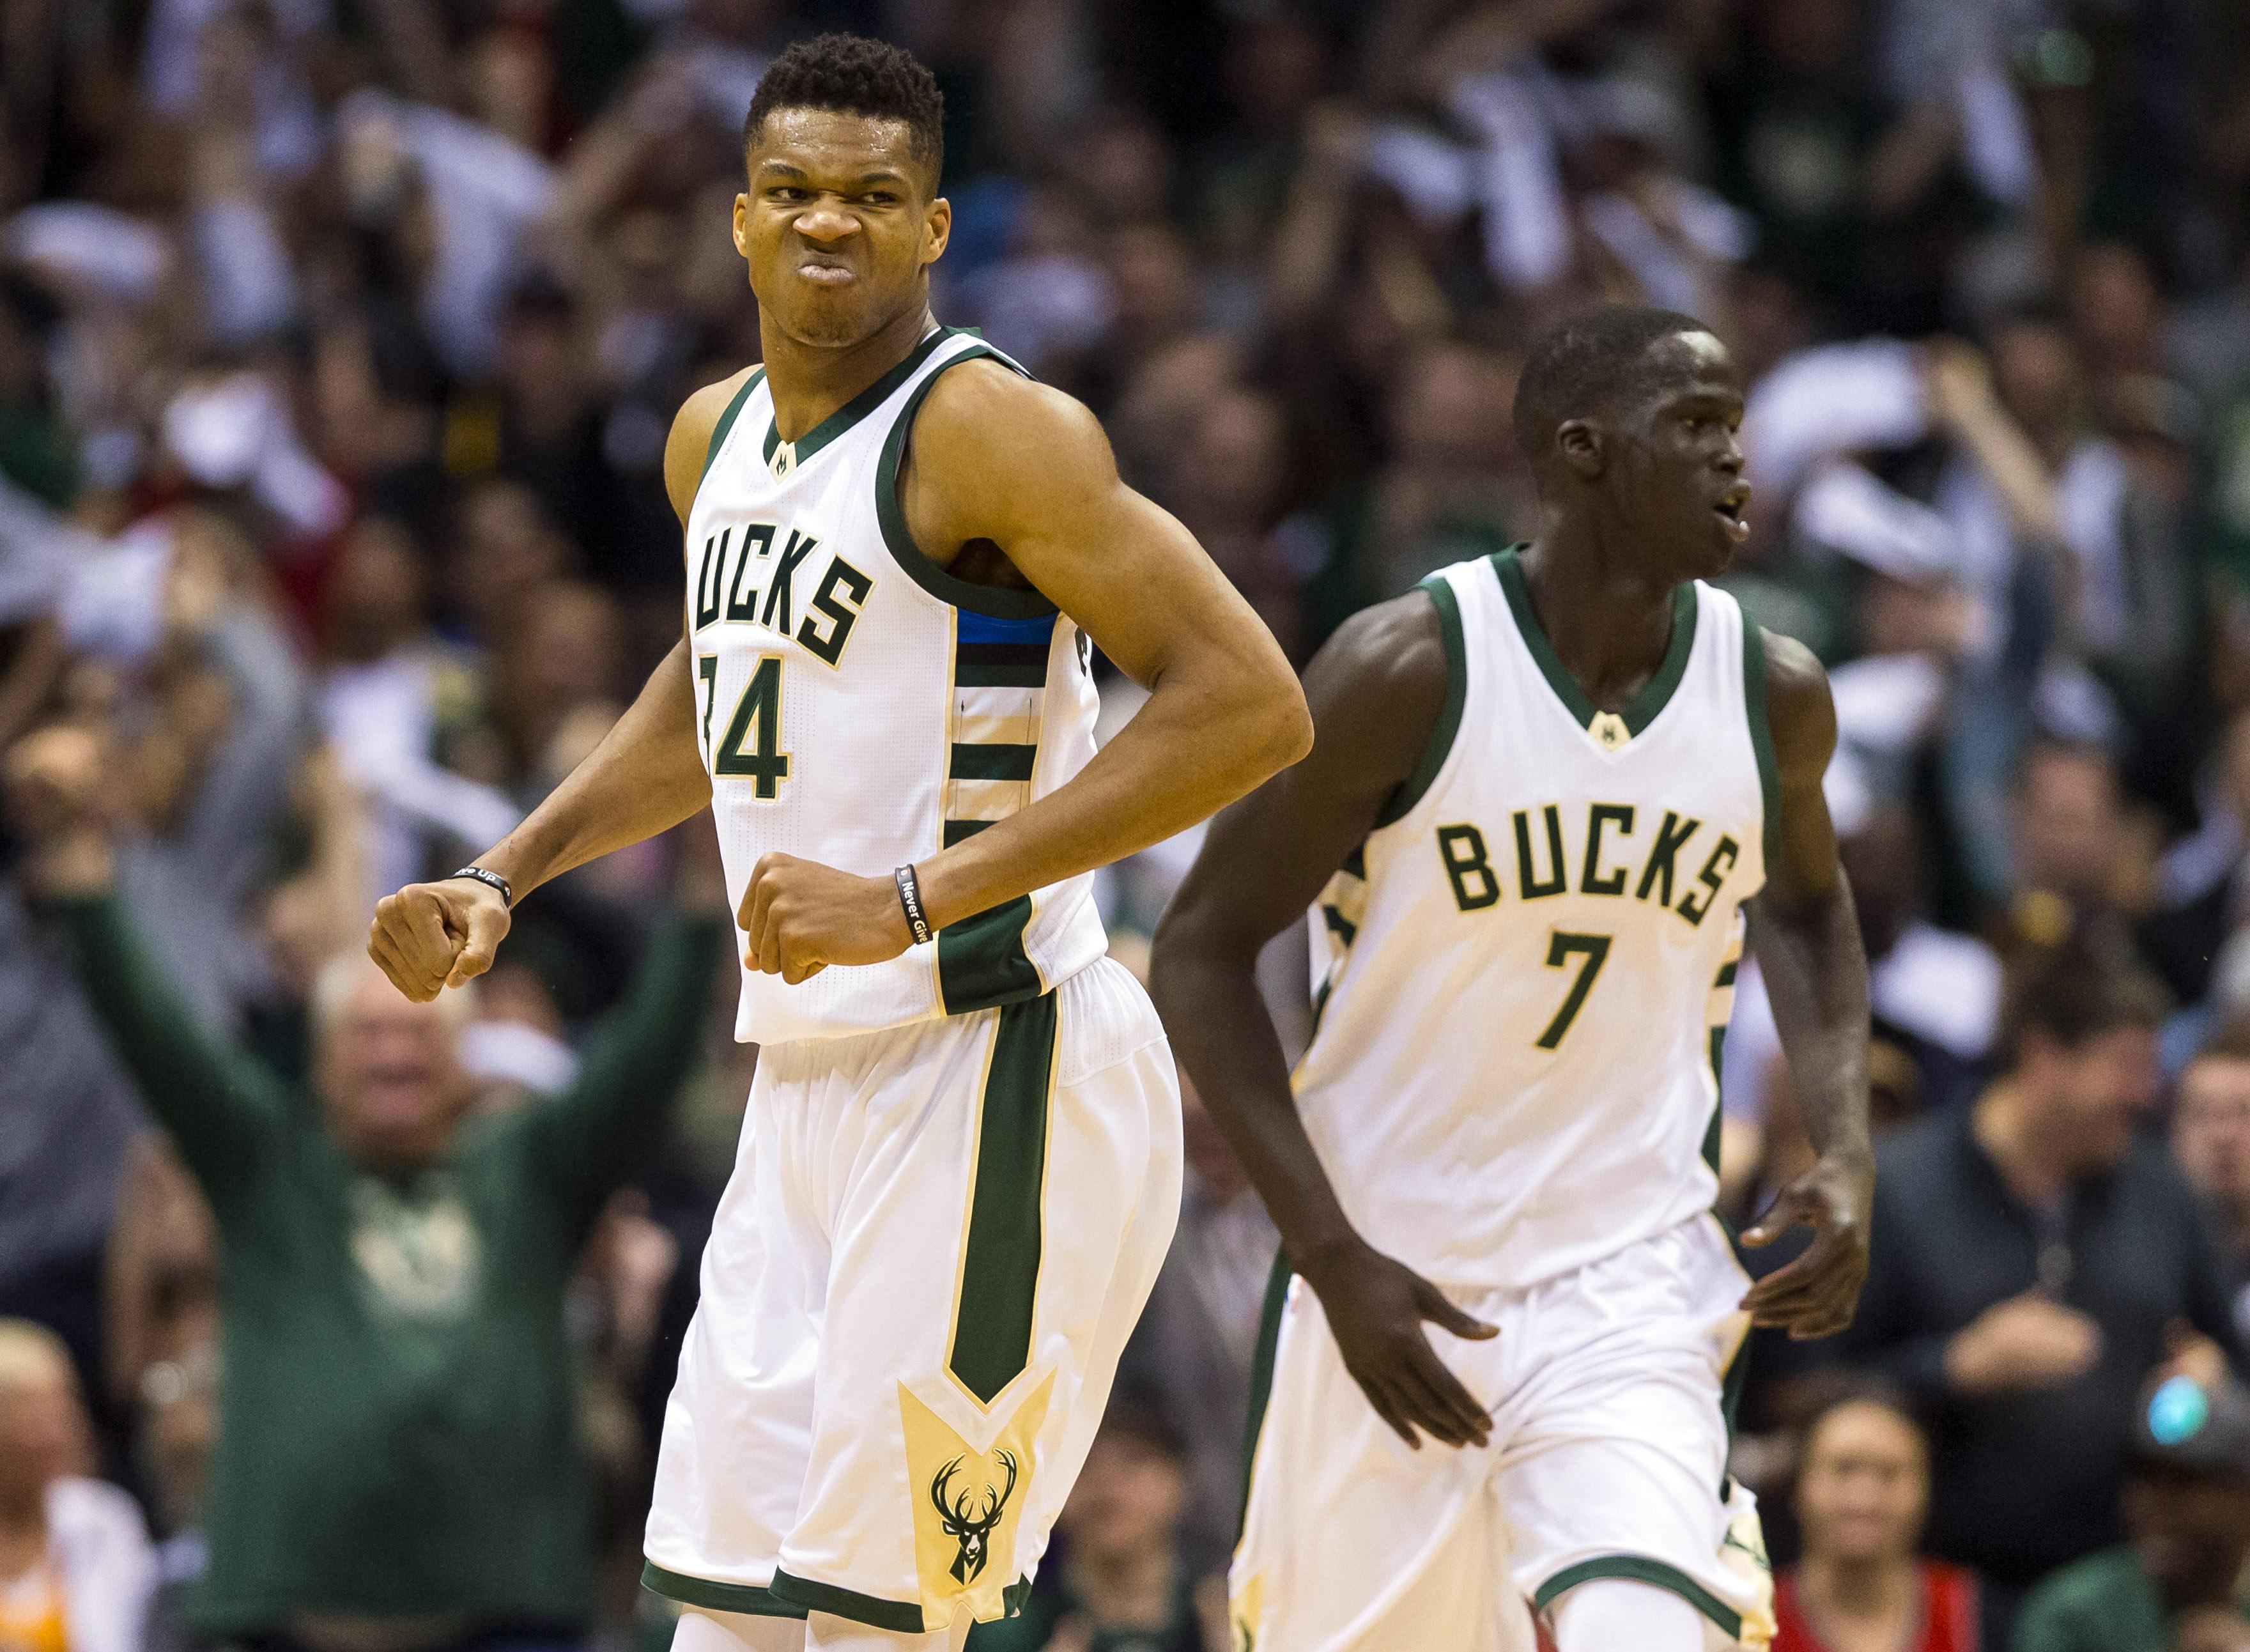 Raptors take 3-2 lead over Bucks